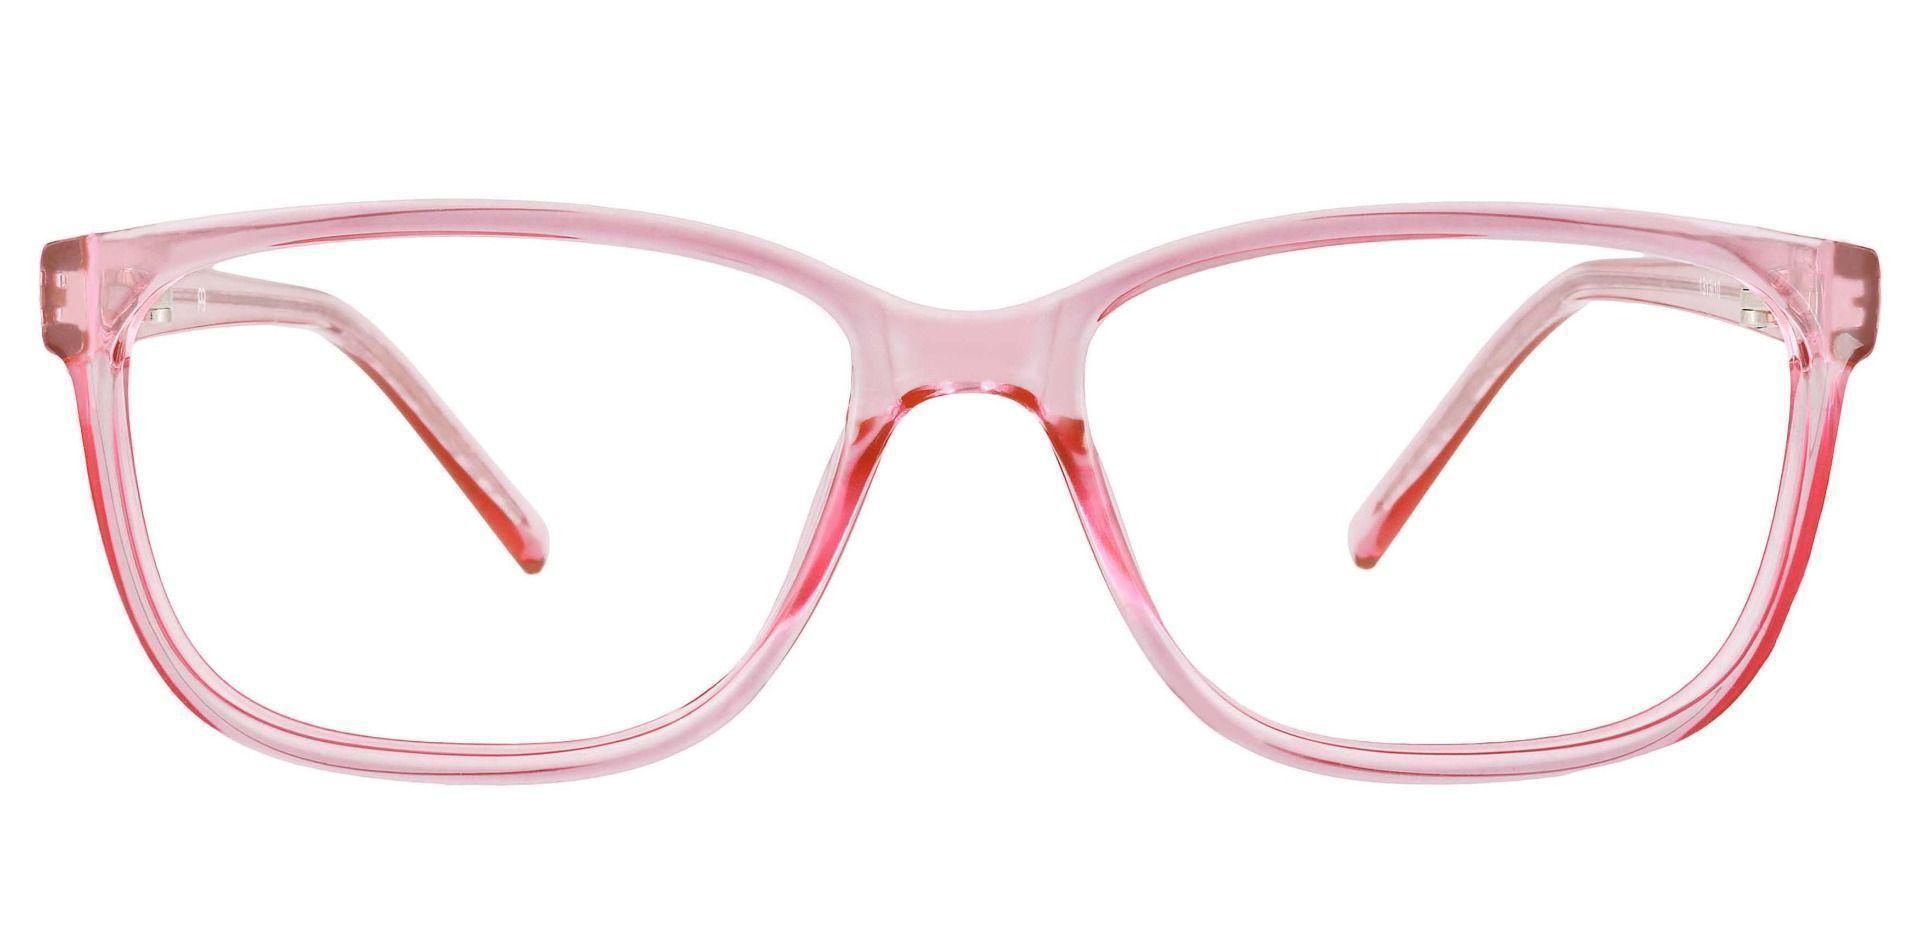 Neville Rectangle Prescription Glasses - Pink